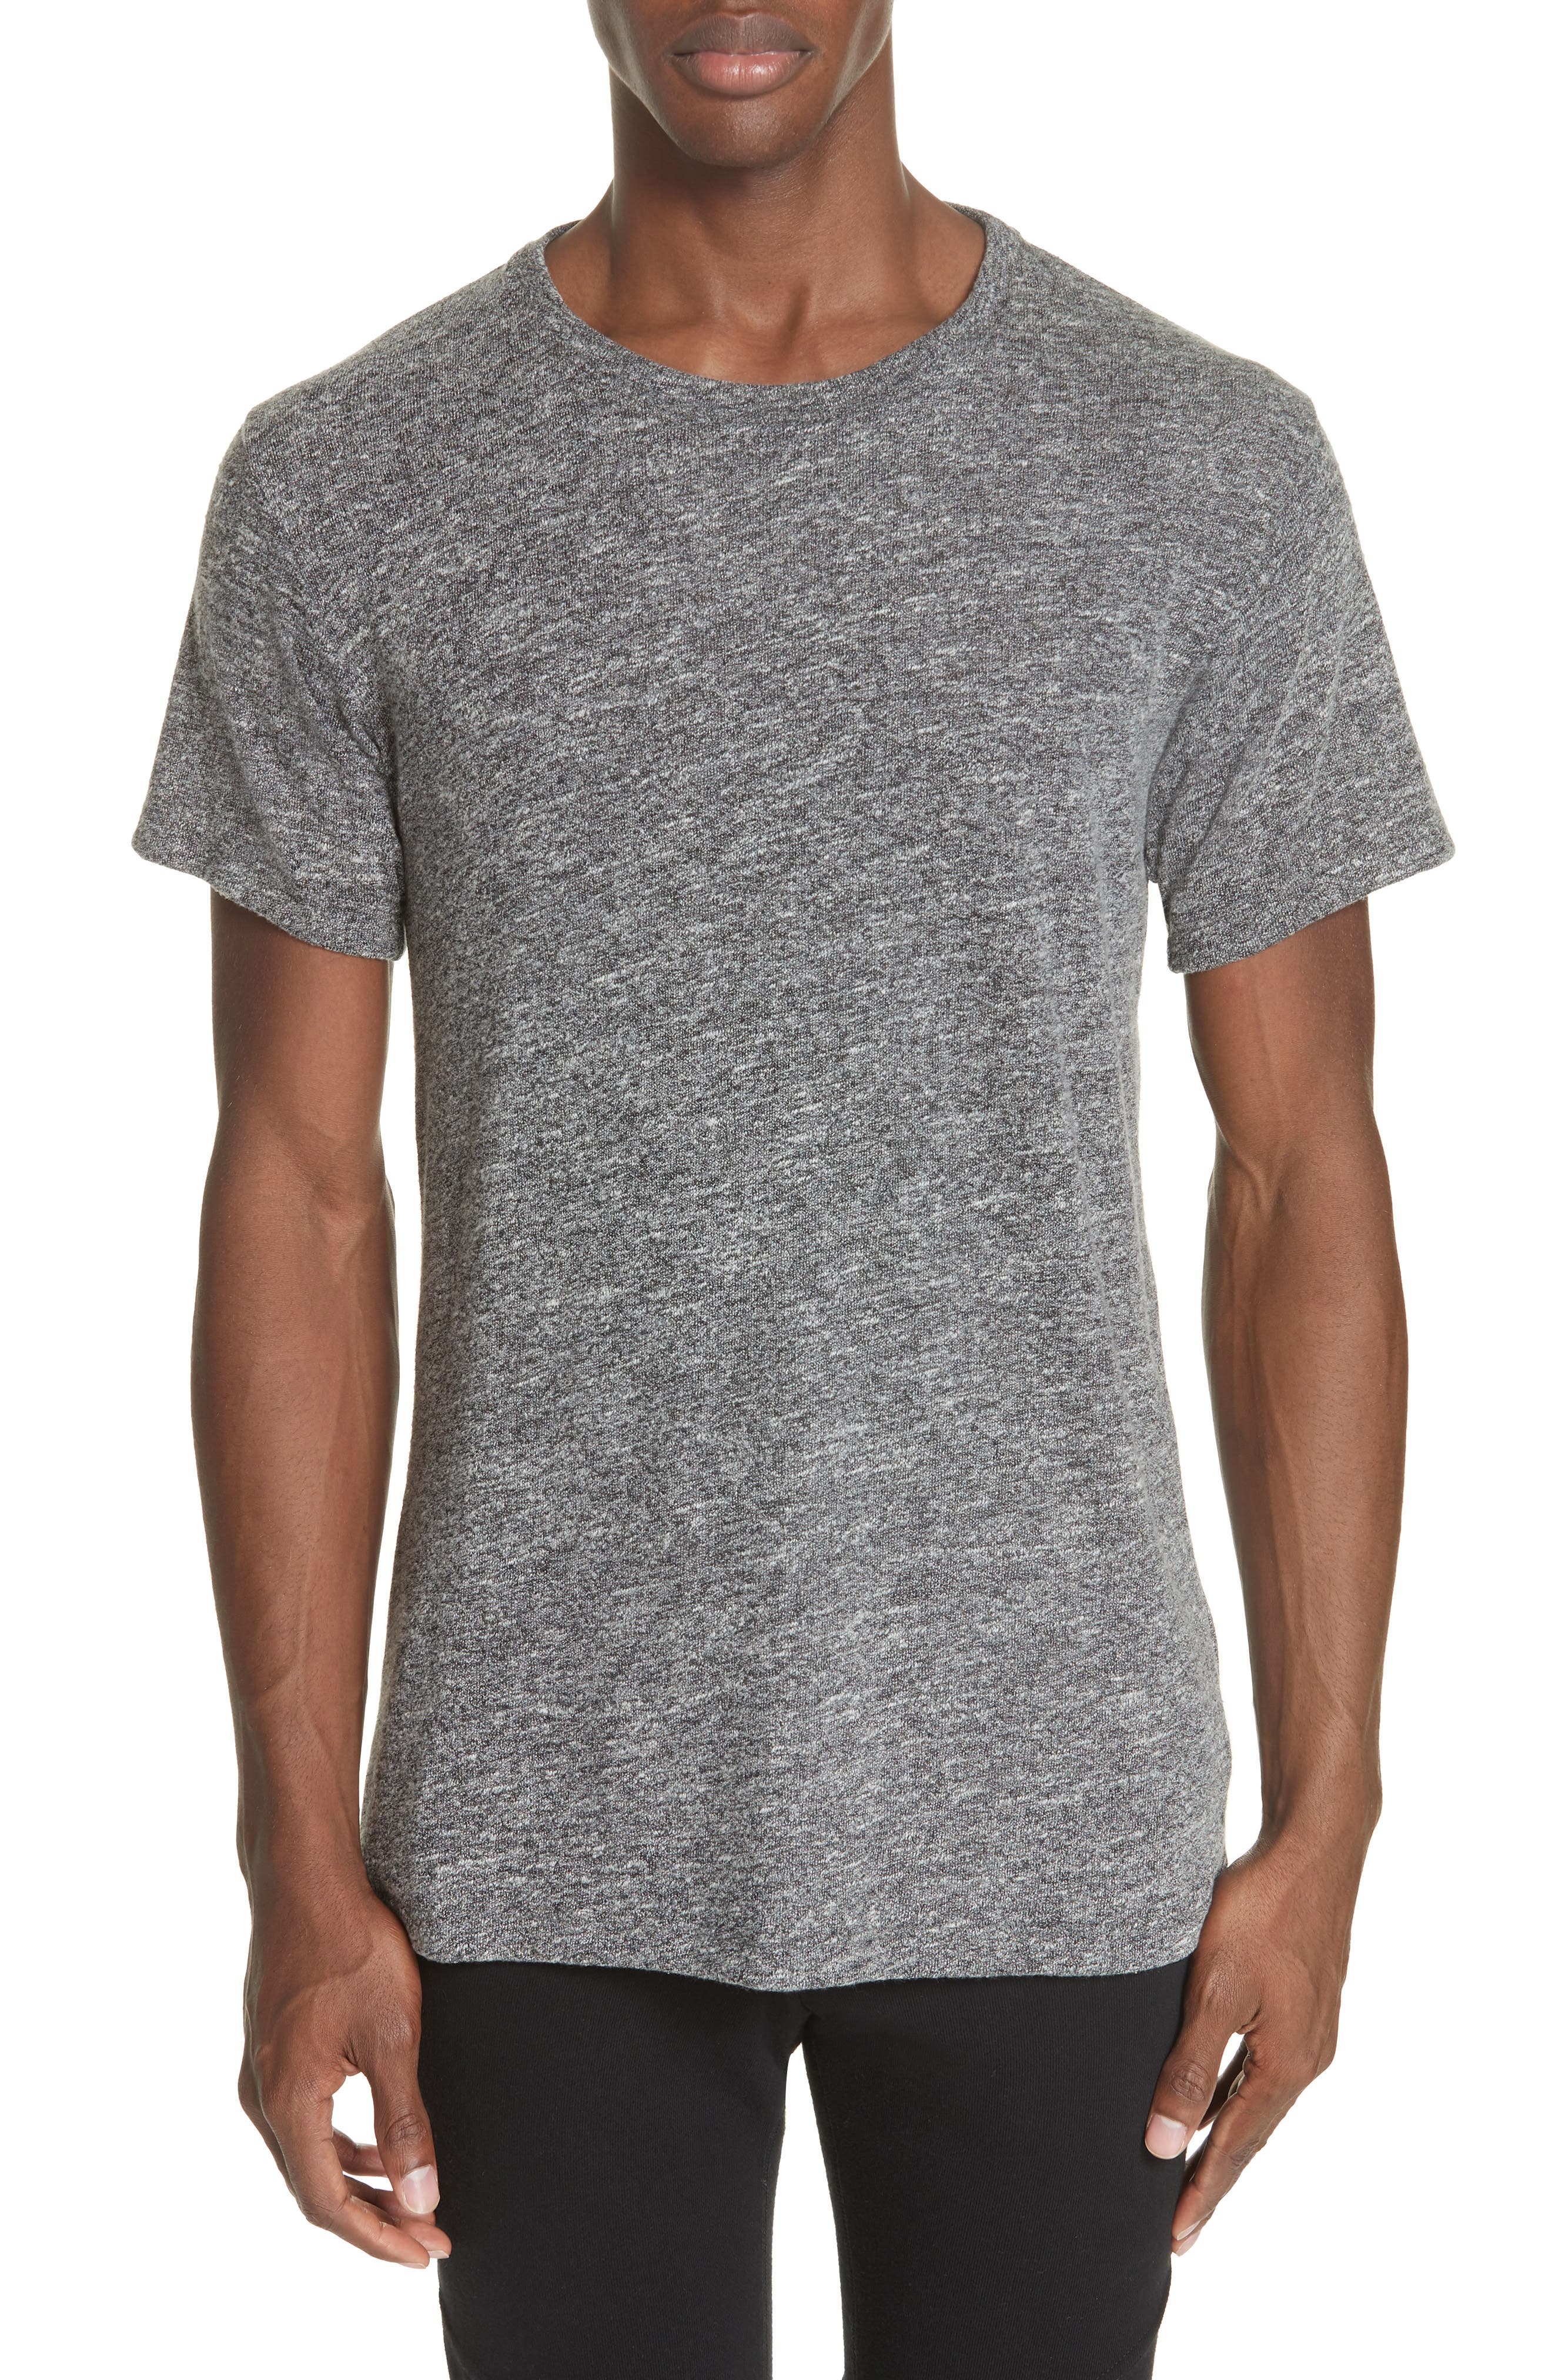 Classic Co-Mix Crew T-Shirt,                             Main thumbnail 1, color,                             CHARCOAL